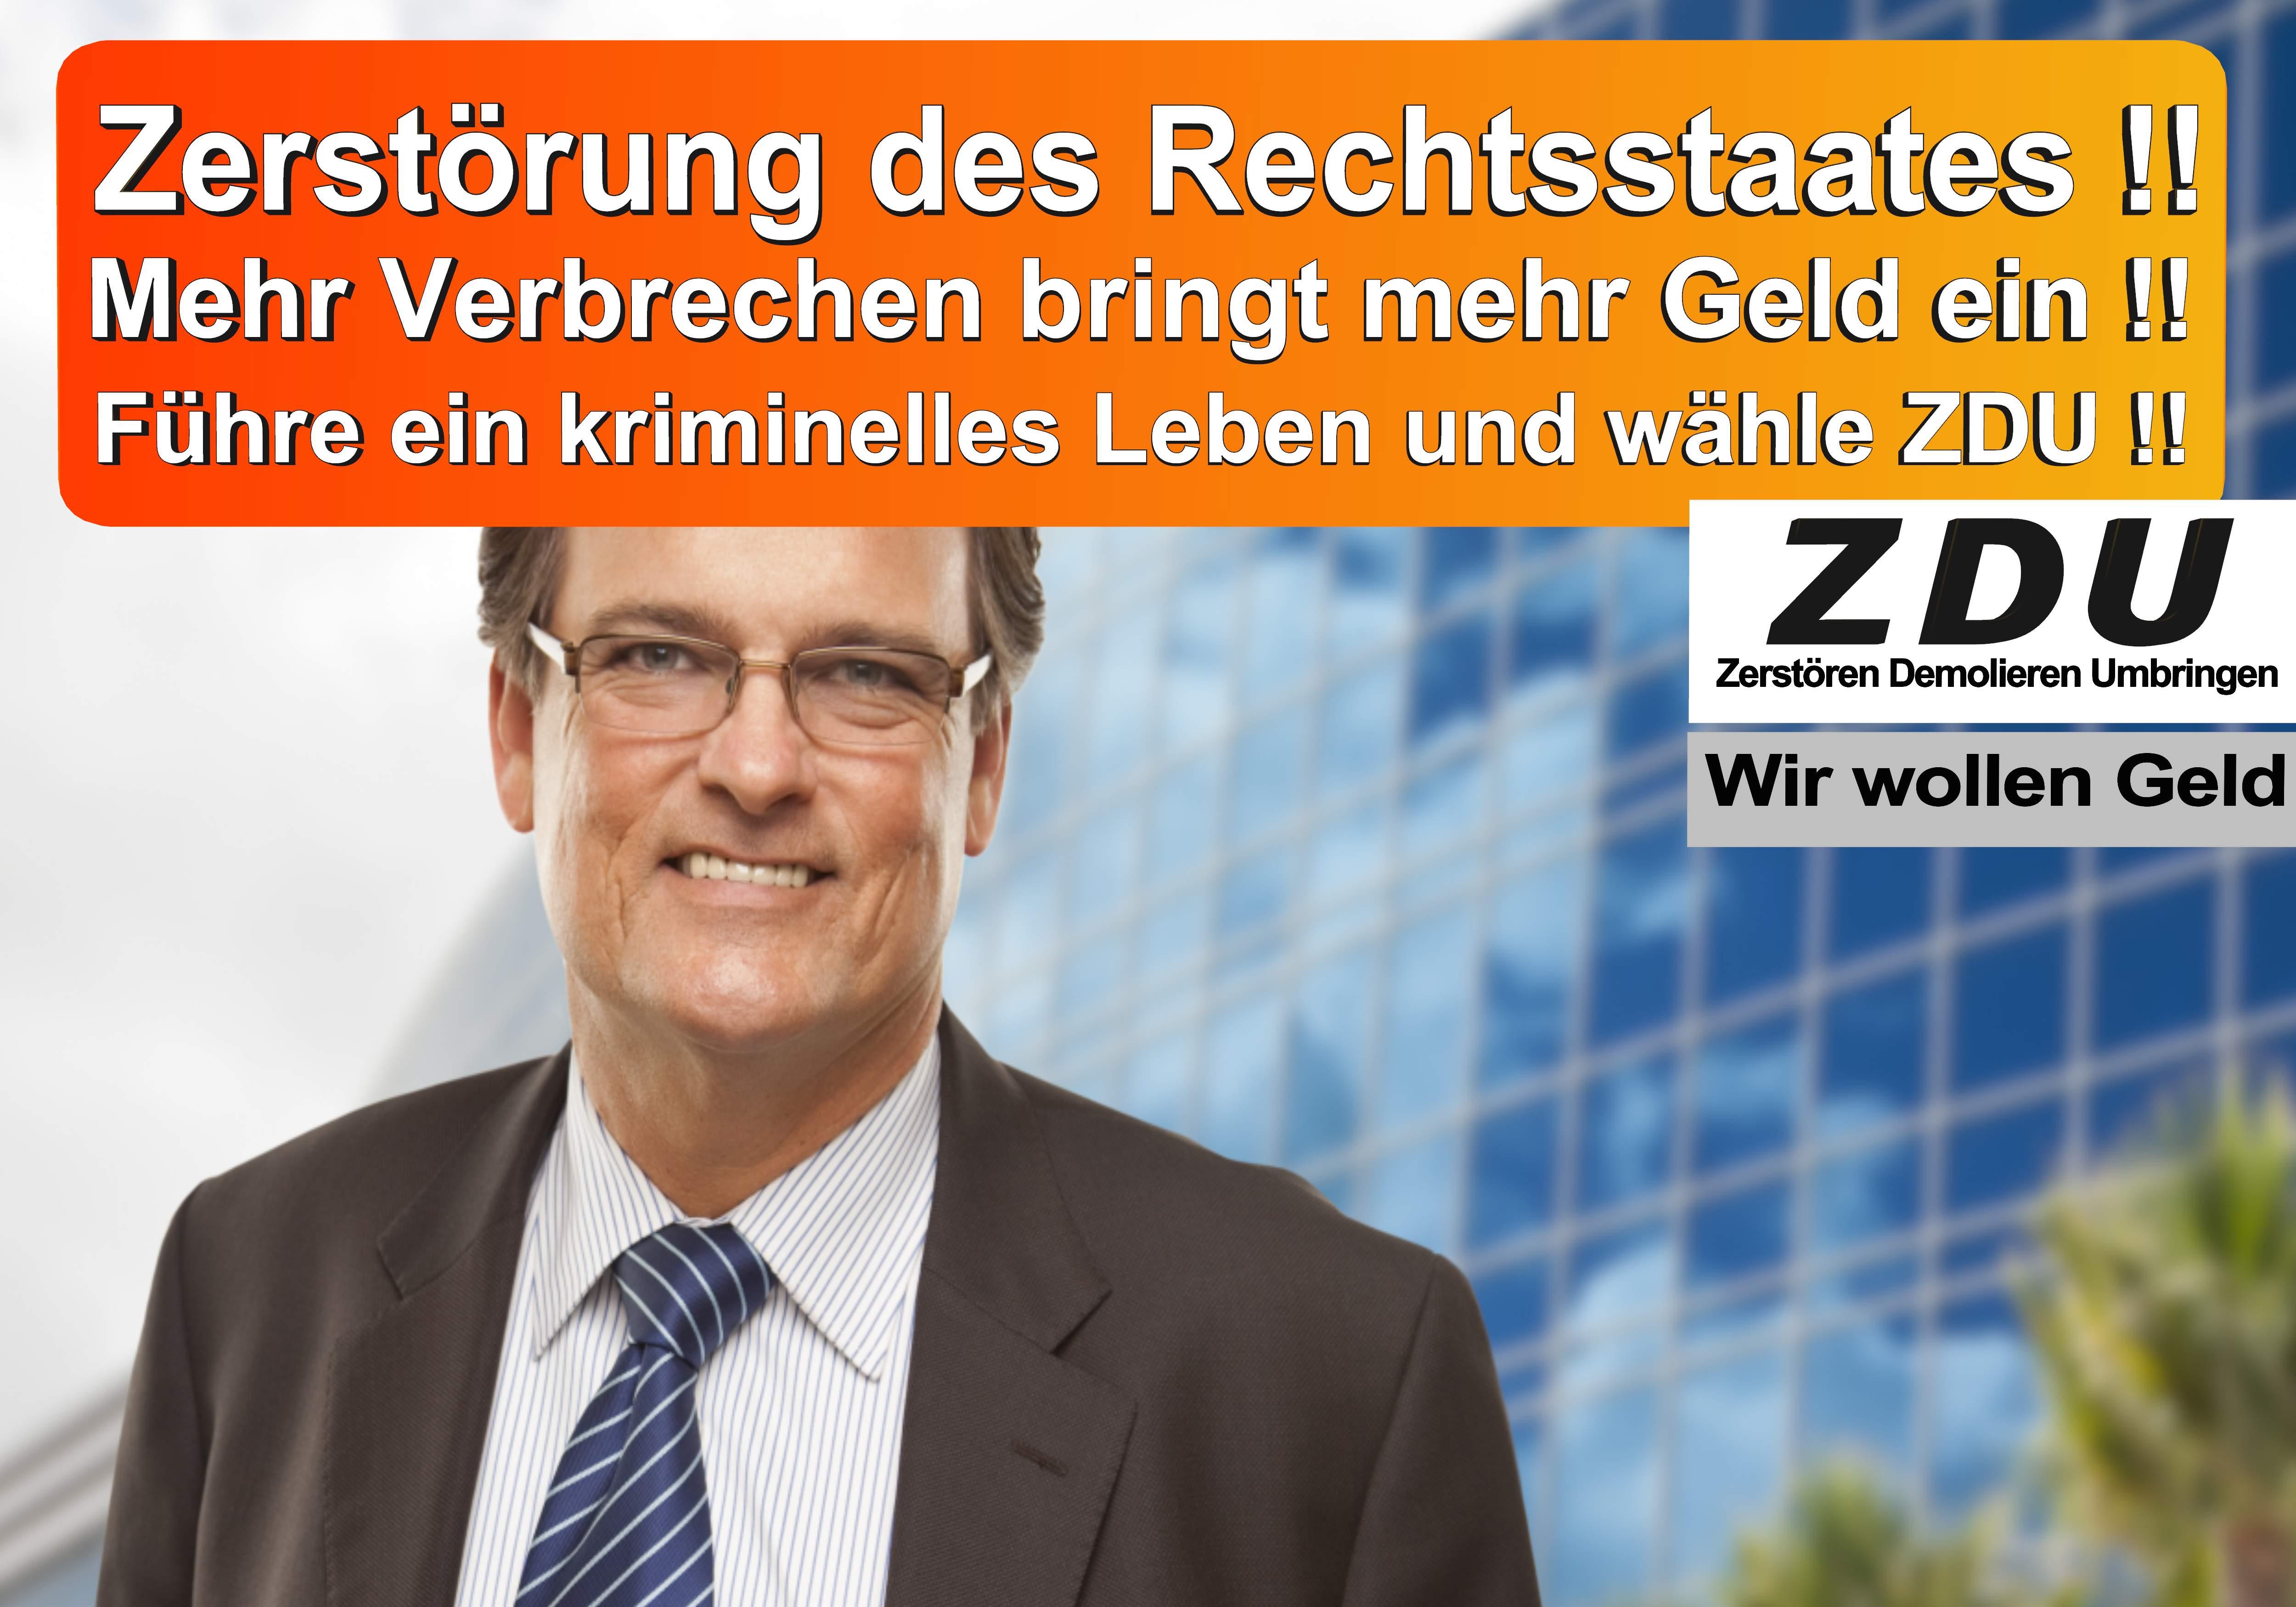 Bundestagswahl 2017 CDU SPD AfD Wahlplakat Angela Merkel CDU CSU (28)